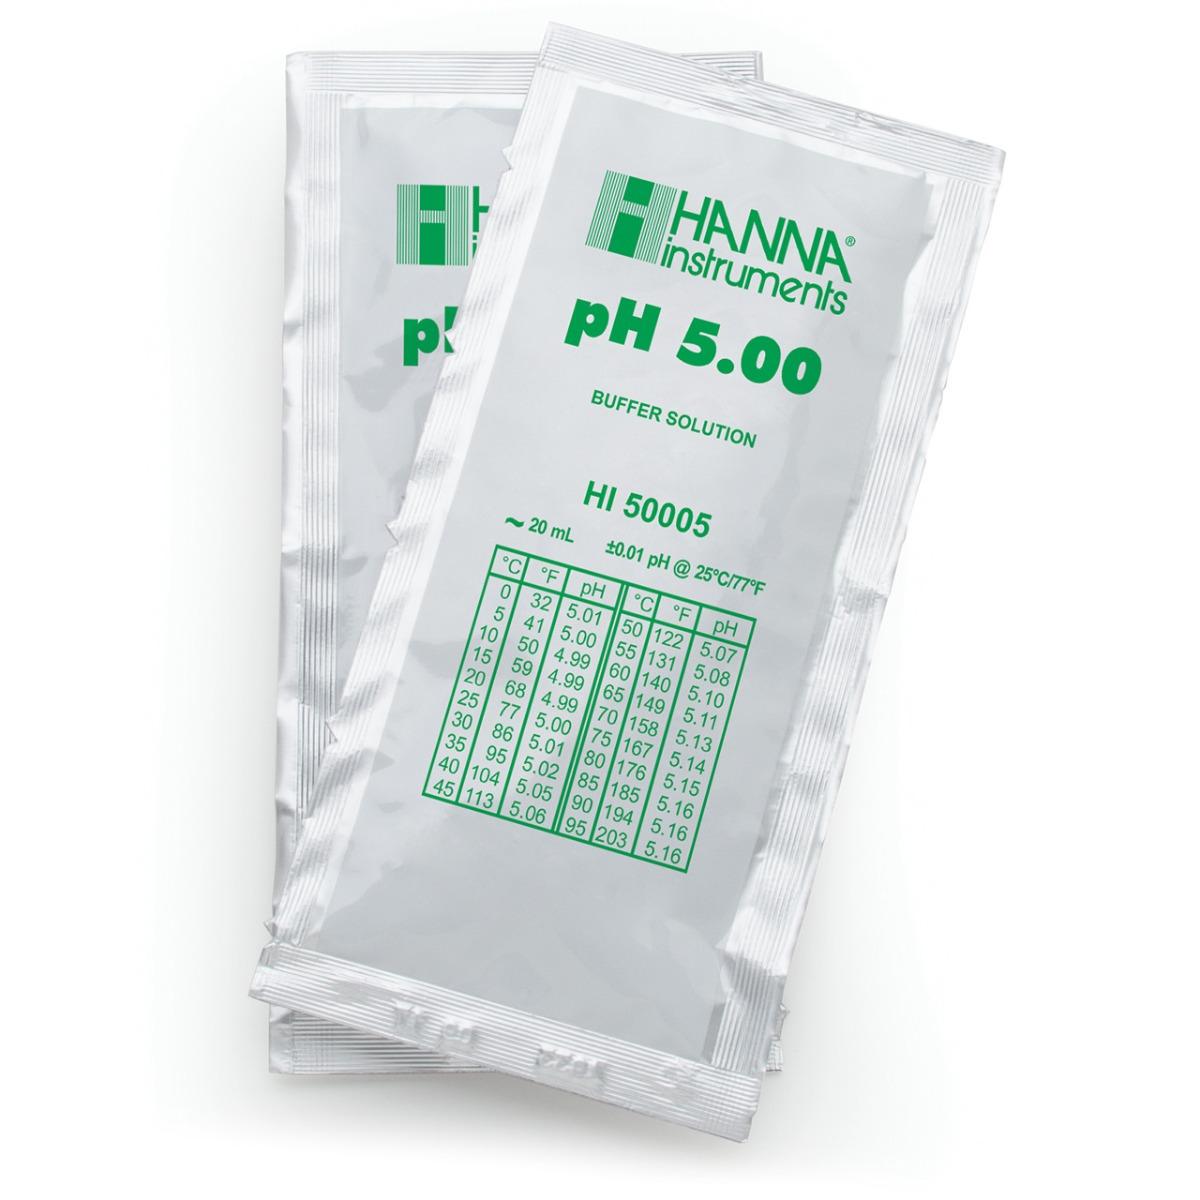 HI50005-02 pH 5.00 Technical Calibration Buffer (25 x 20 mL) Sachets